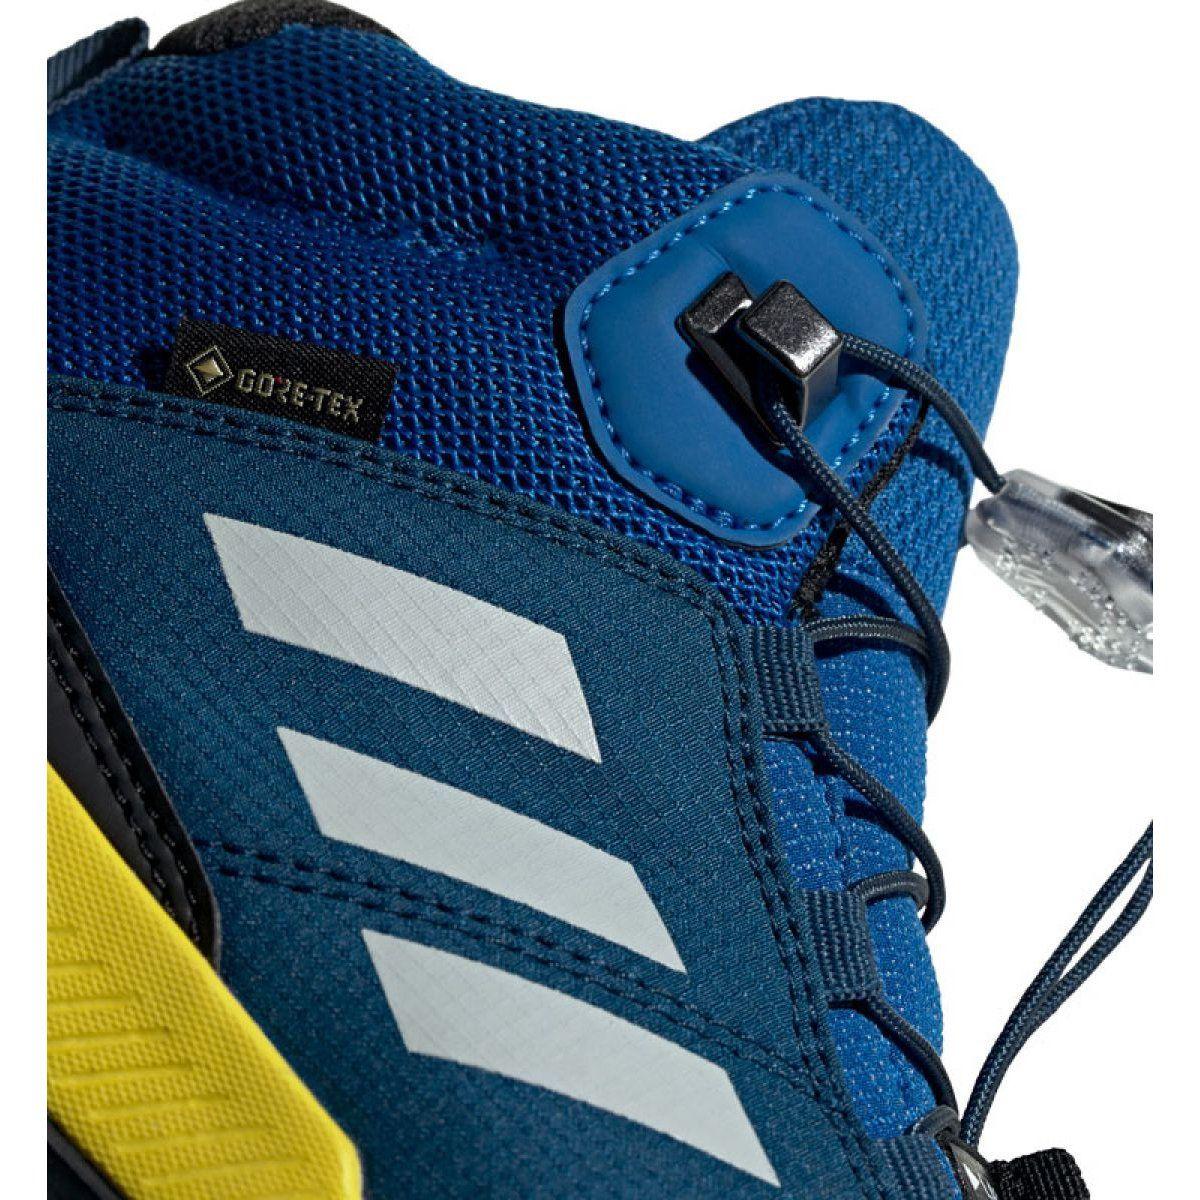 Adidas Terrex Mid Gtx Jr Bc0596 Shoes Black Blue Green Adidas Junior Shoes Durable Shoes